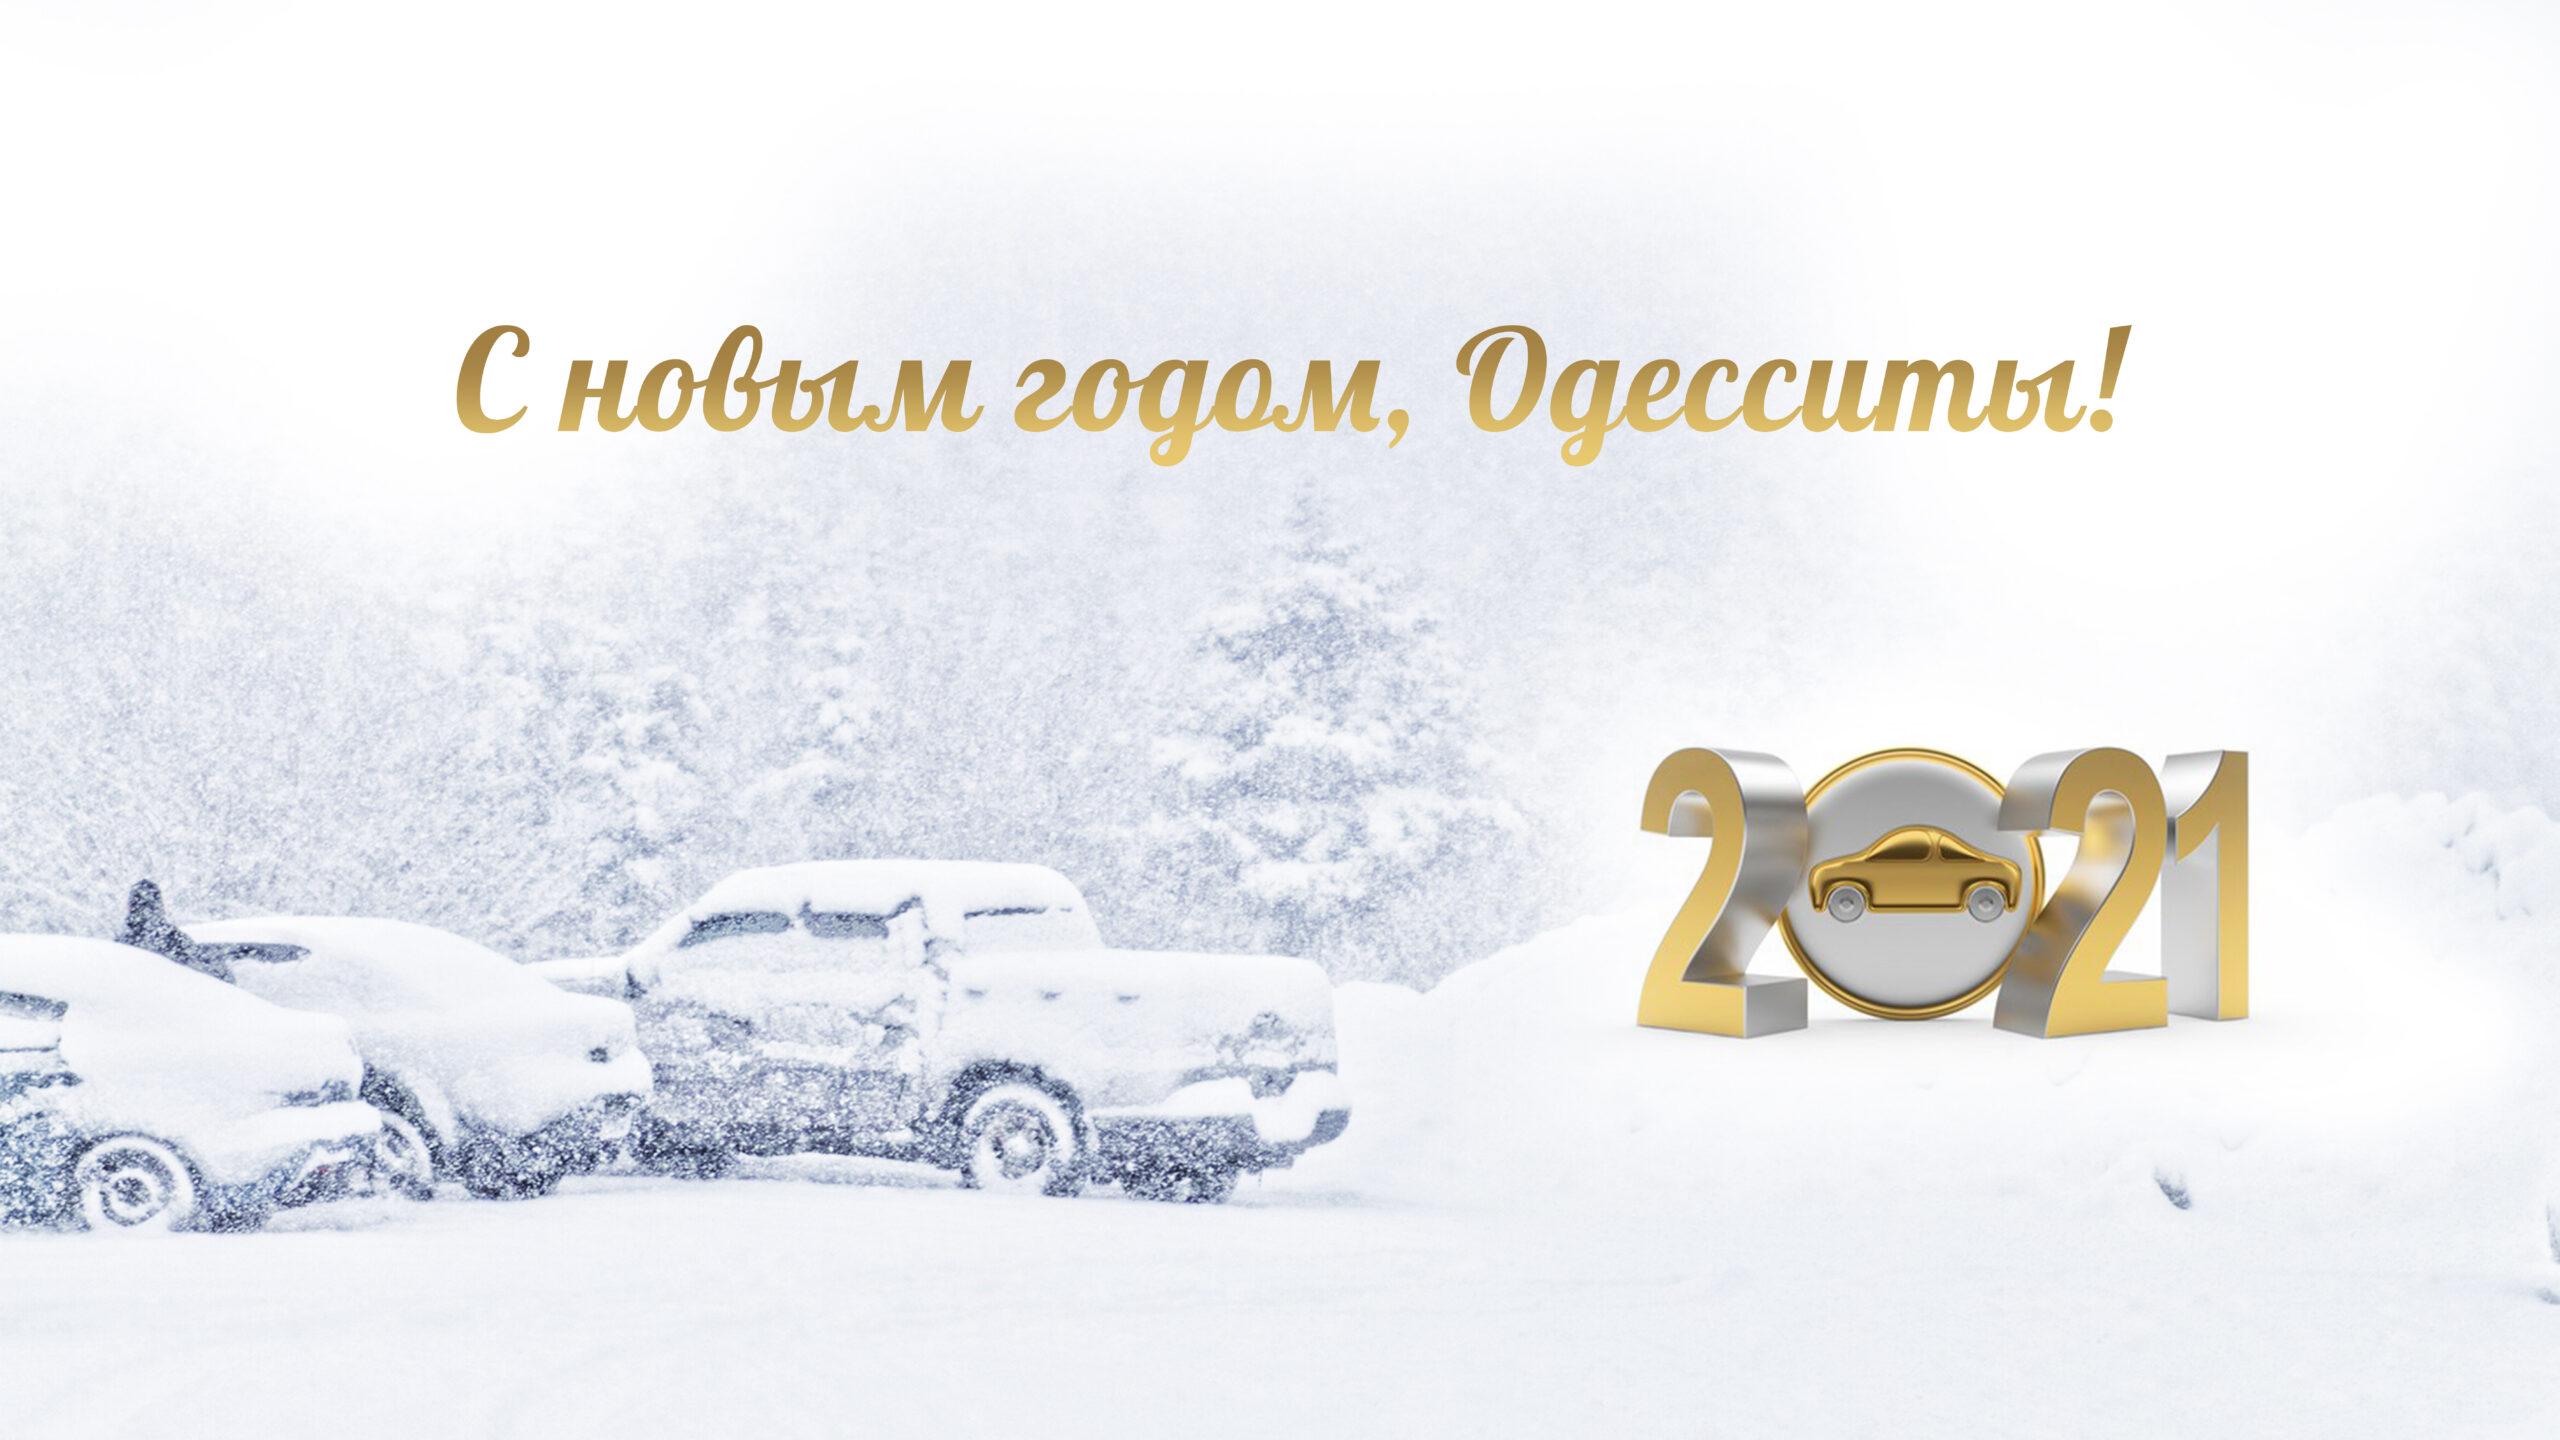 2021-numbers-car-3d-element 290464-406